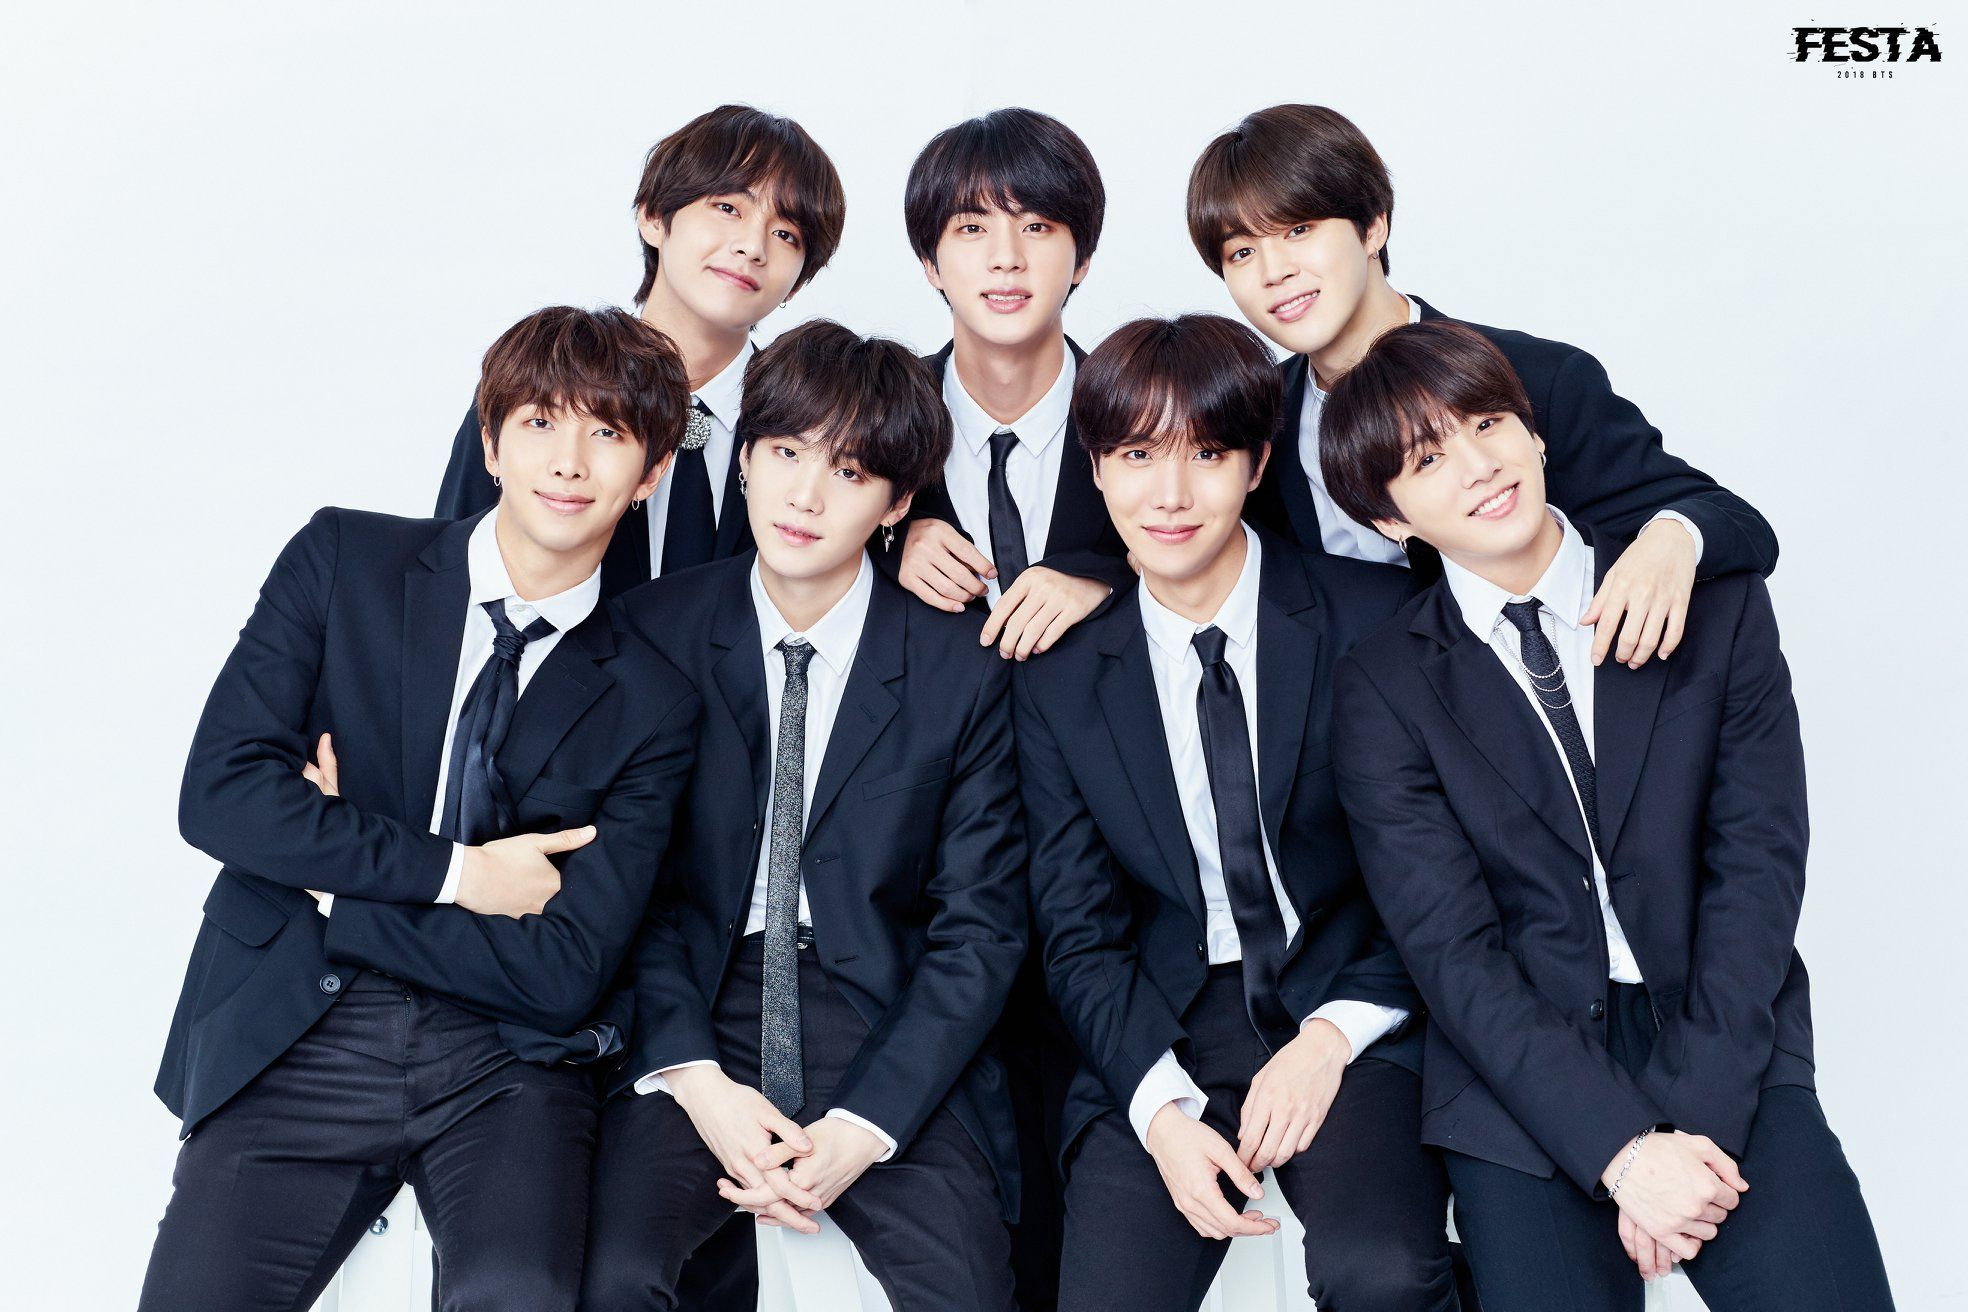 Korean Boy Band BTS Makes U.S. Stadium Debut In New York  music  kpop  bts  stadium  debut  citi_field